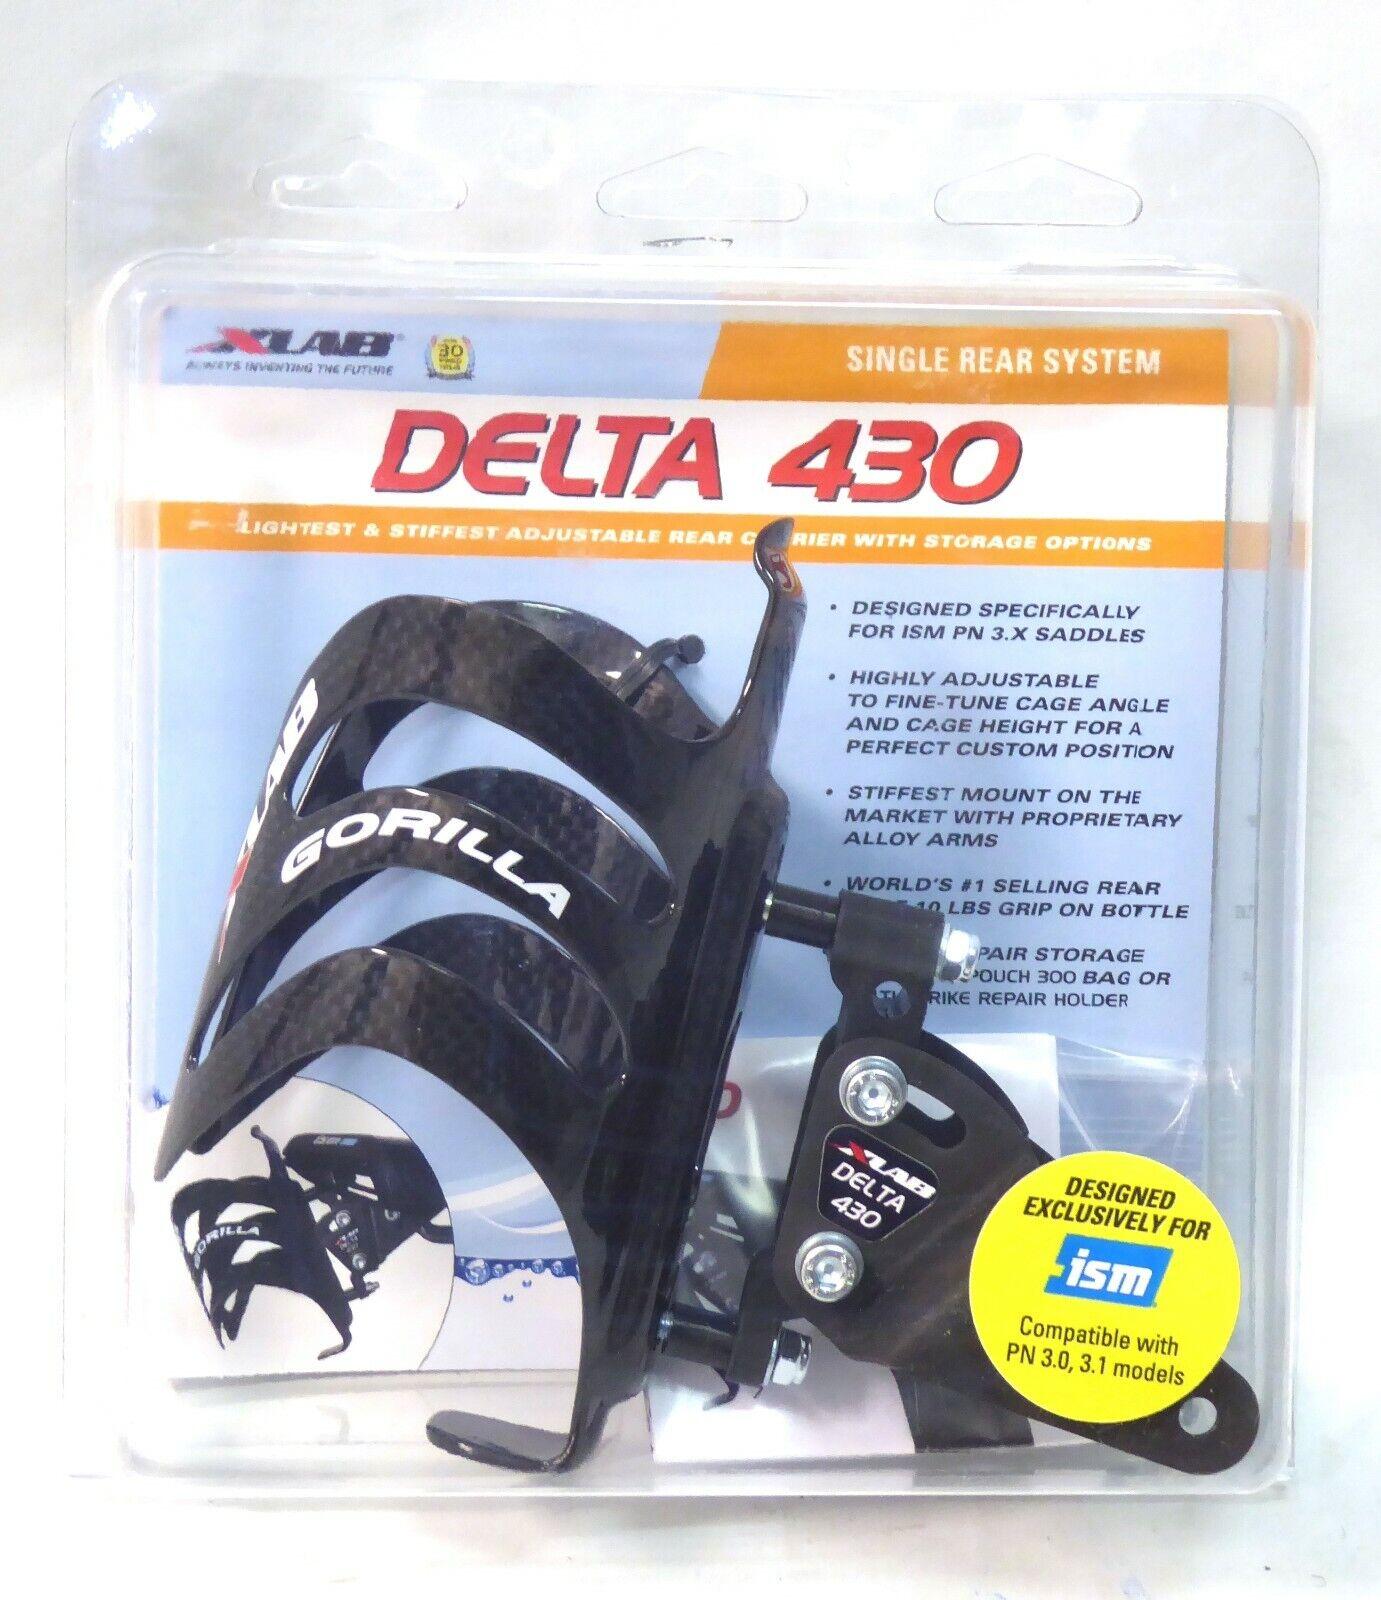 Xlab Delta 430 Cochebono Jaula Solo Sistema Trasero x-Lab